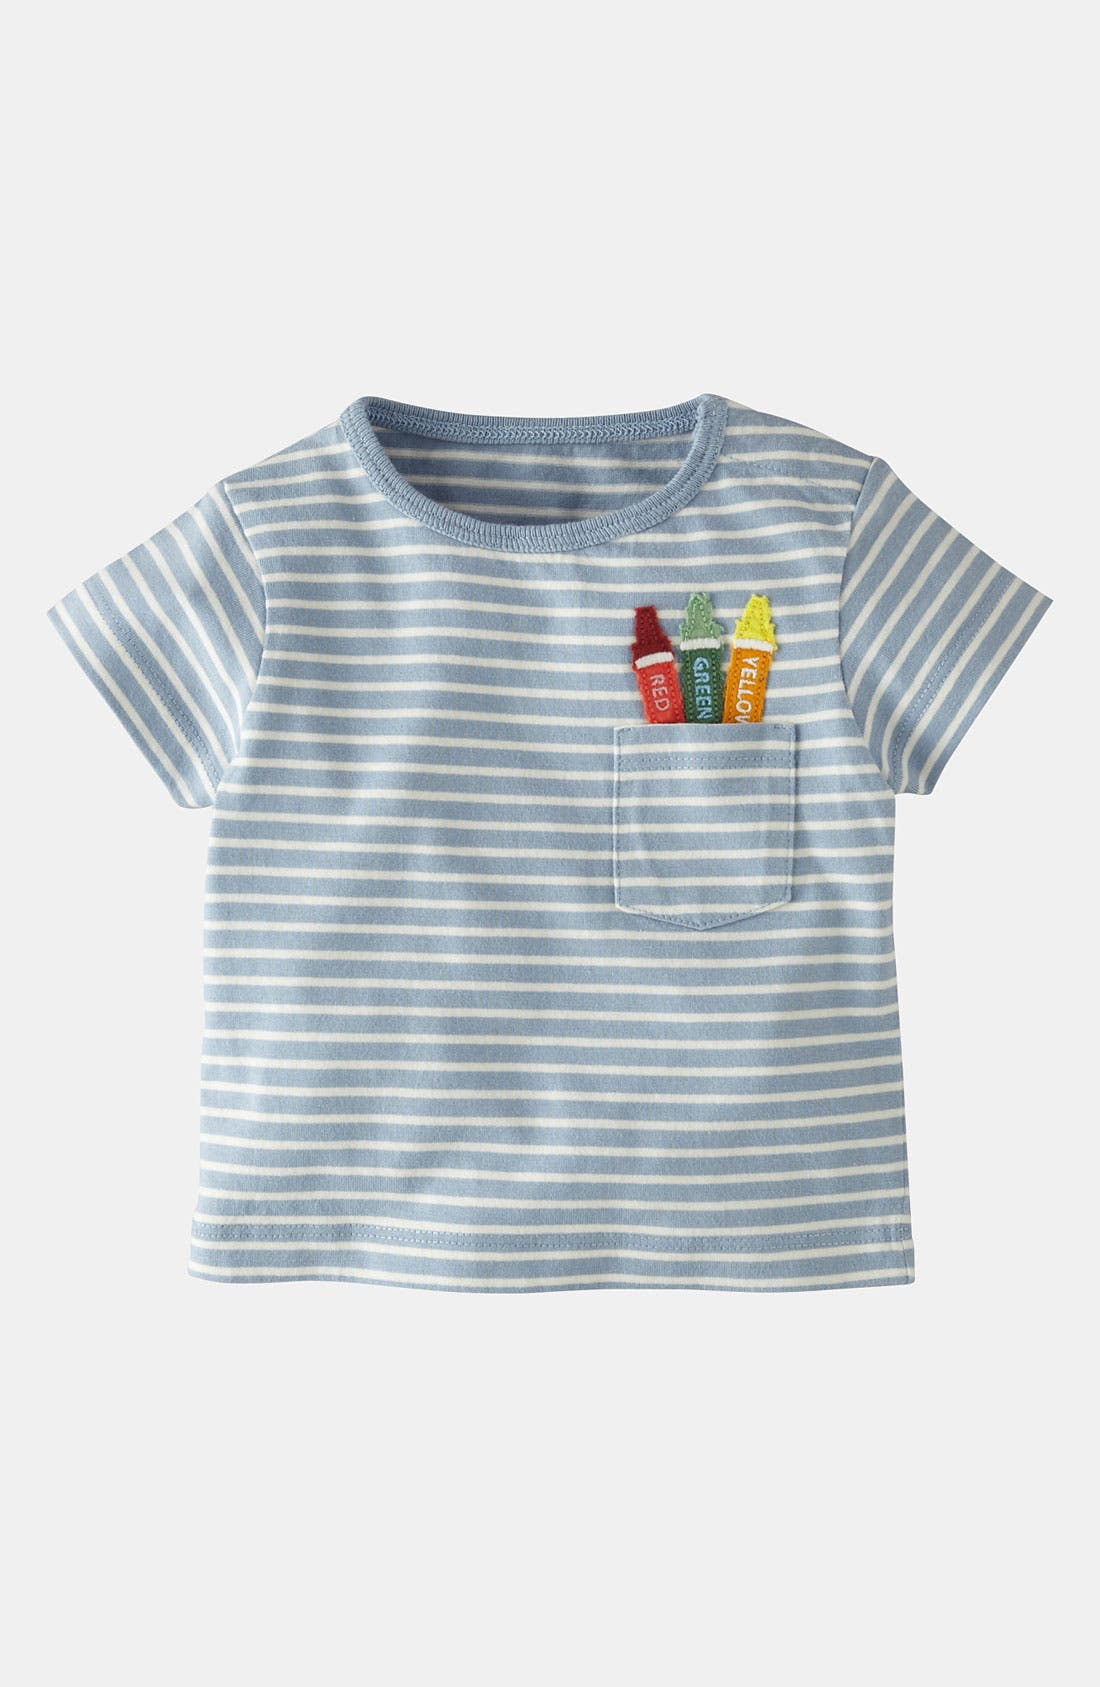 Alternate Image 1 Selected - Mini Boden 'Fun Appliqué' T-Shirt (Baby)